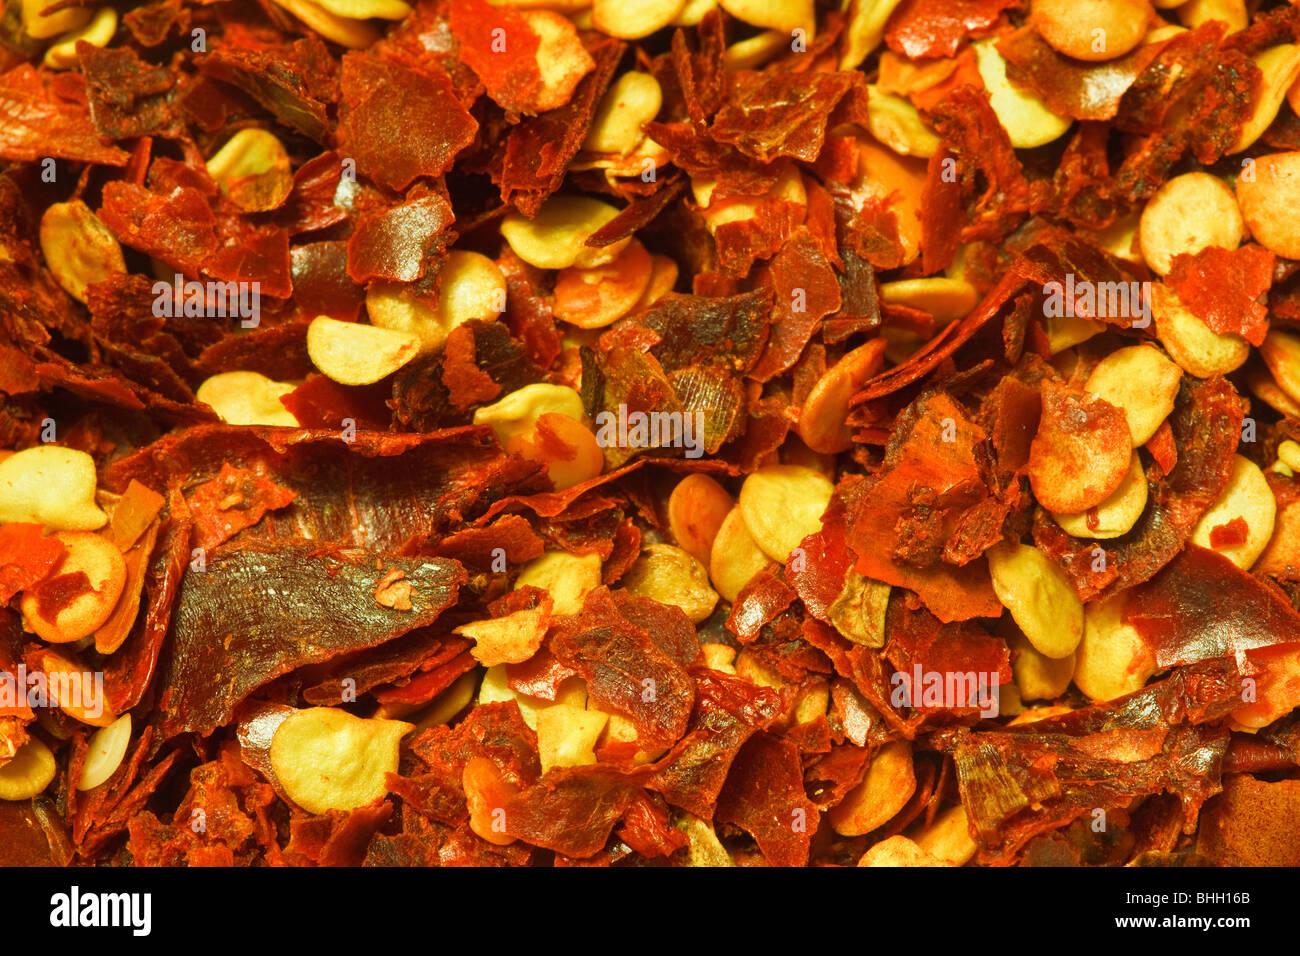 Macro image of crushed chili pepper - Stock Image